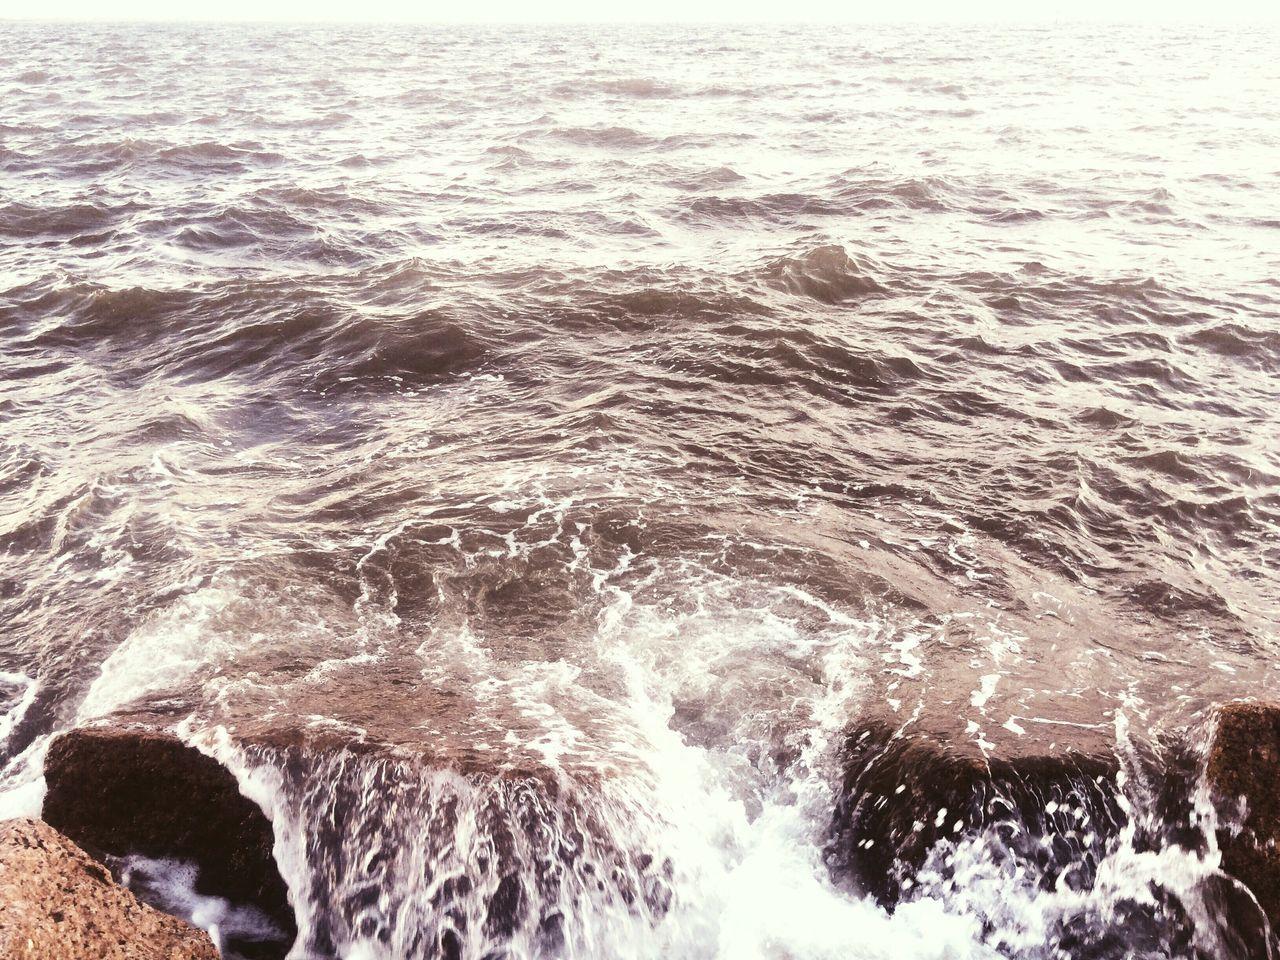 Sea Water Wave Nature No People Outdoors Beach Motion Rocks Waves Crashing